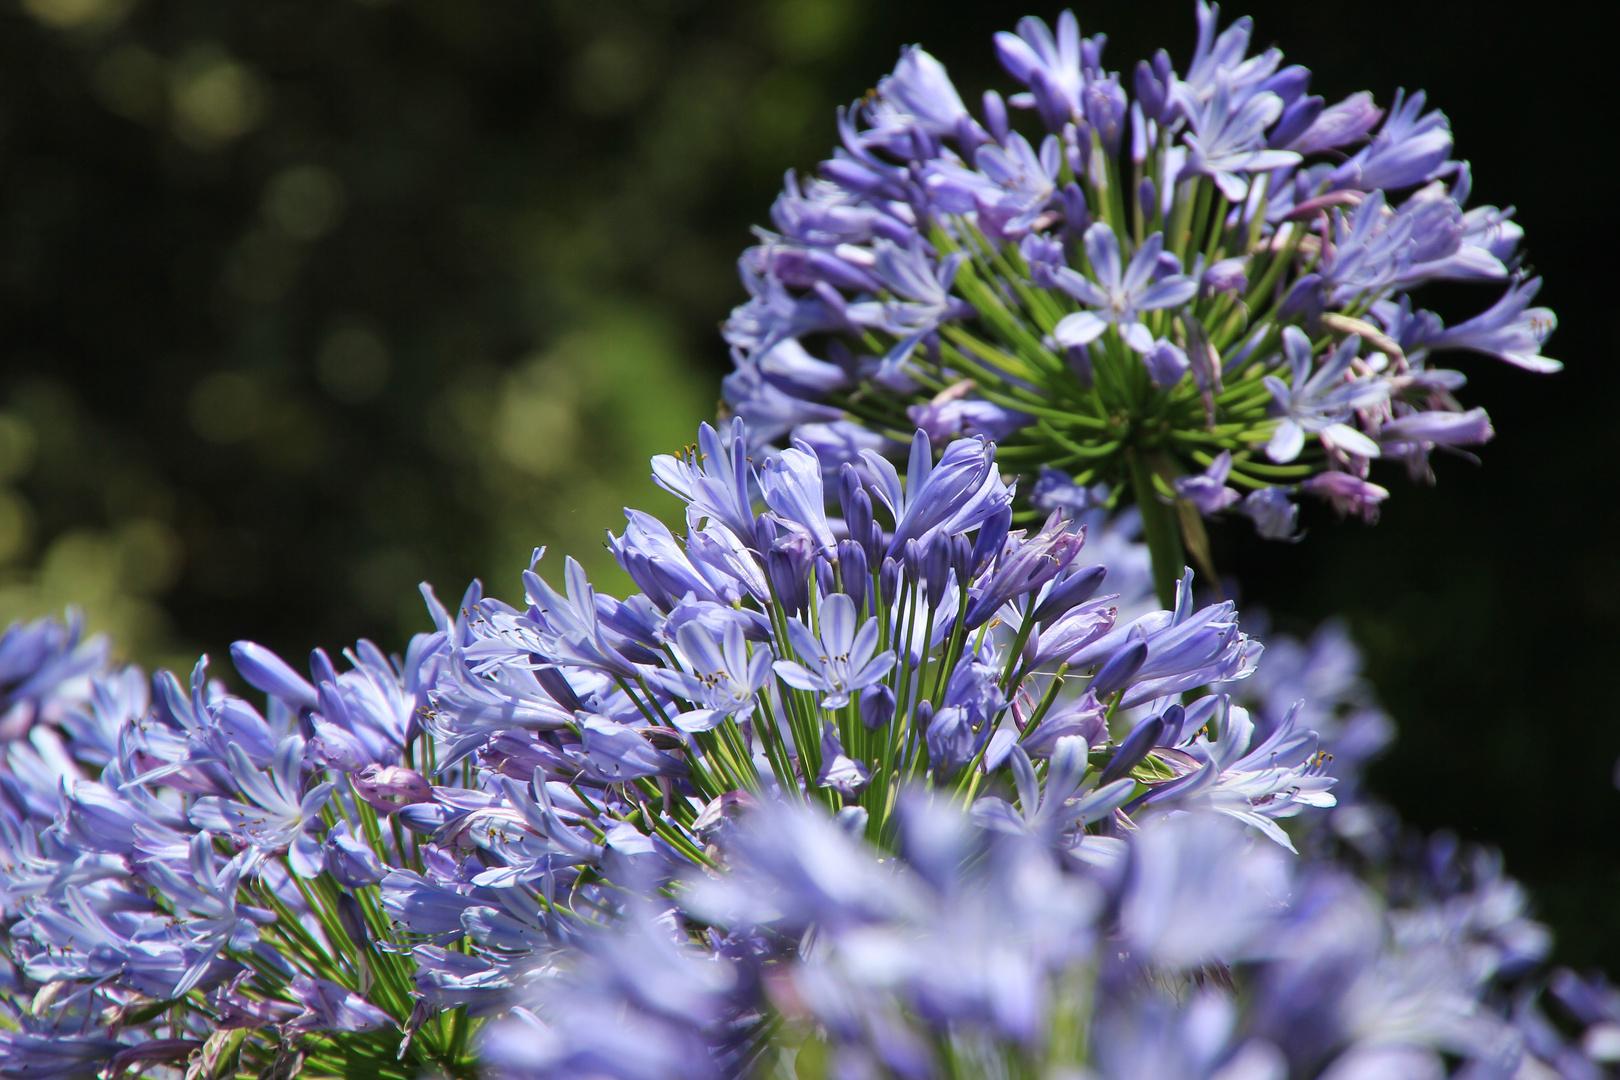 Agapanthus violett